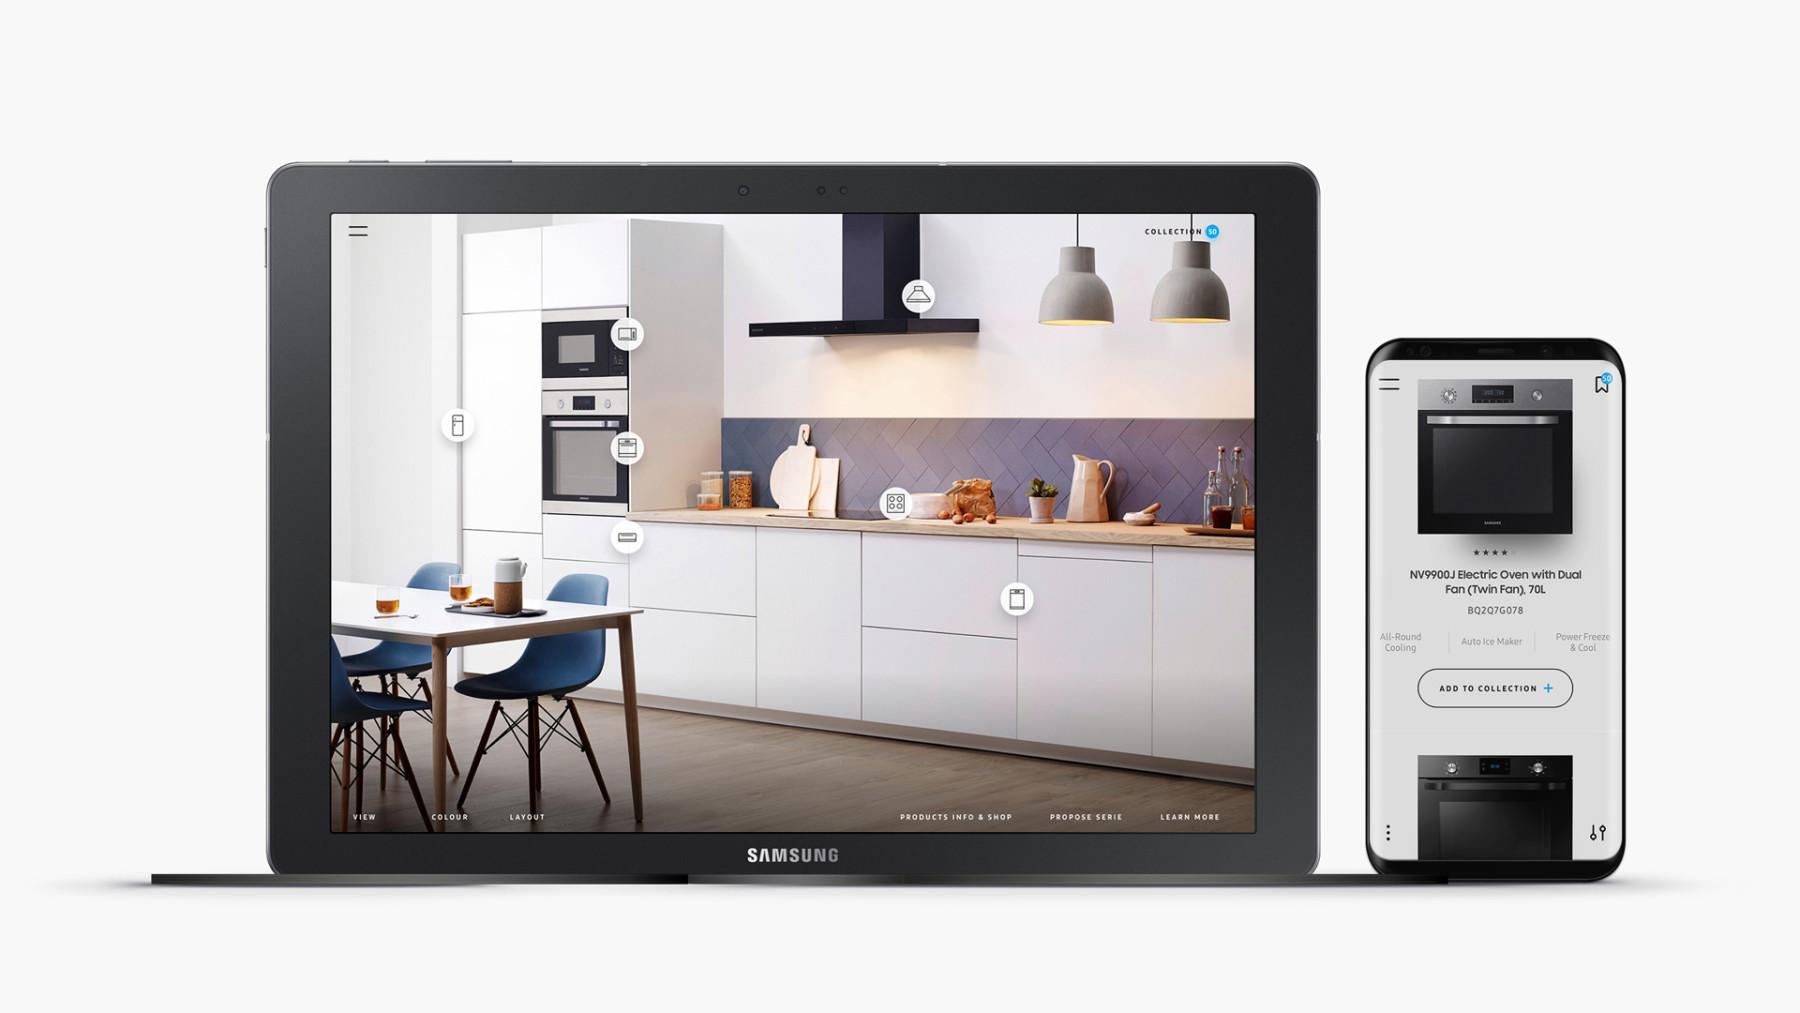 SamsungTablet-Galaxys8 1920x1080-2-1800x1013